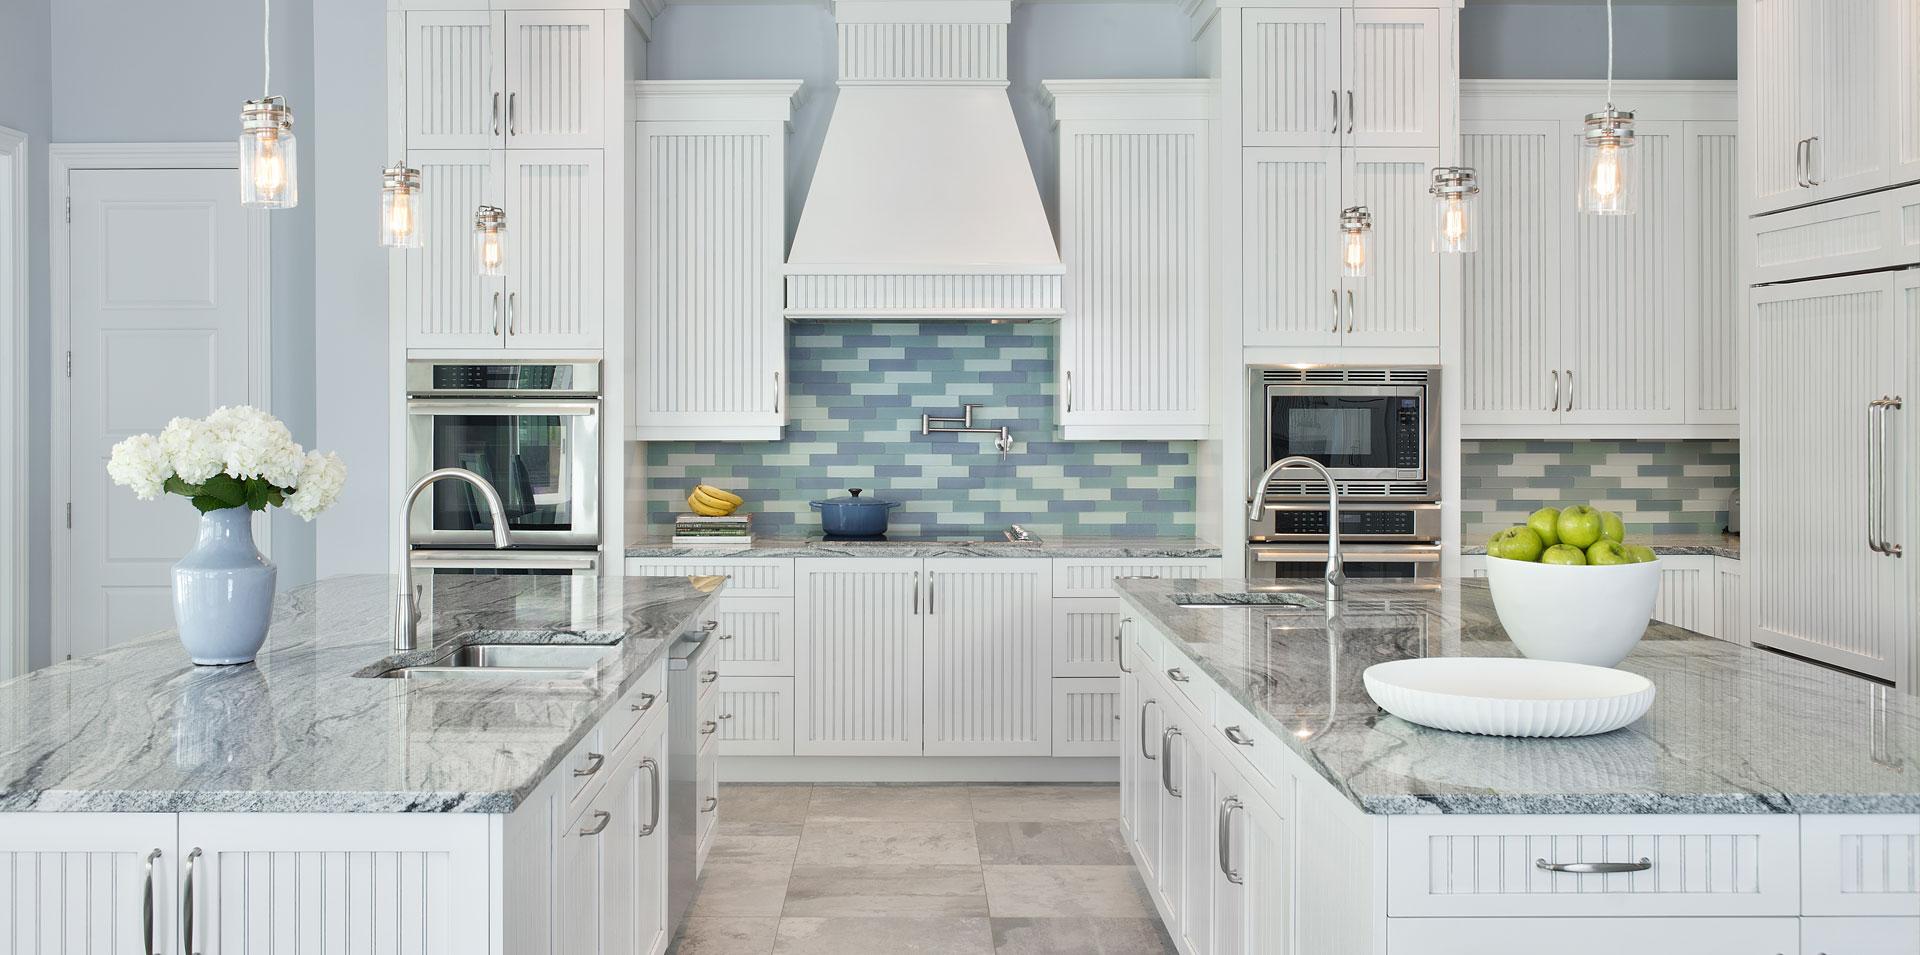 Kitchen Remodel Naples Florida | Borelli Construction of Naples